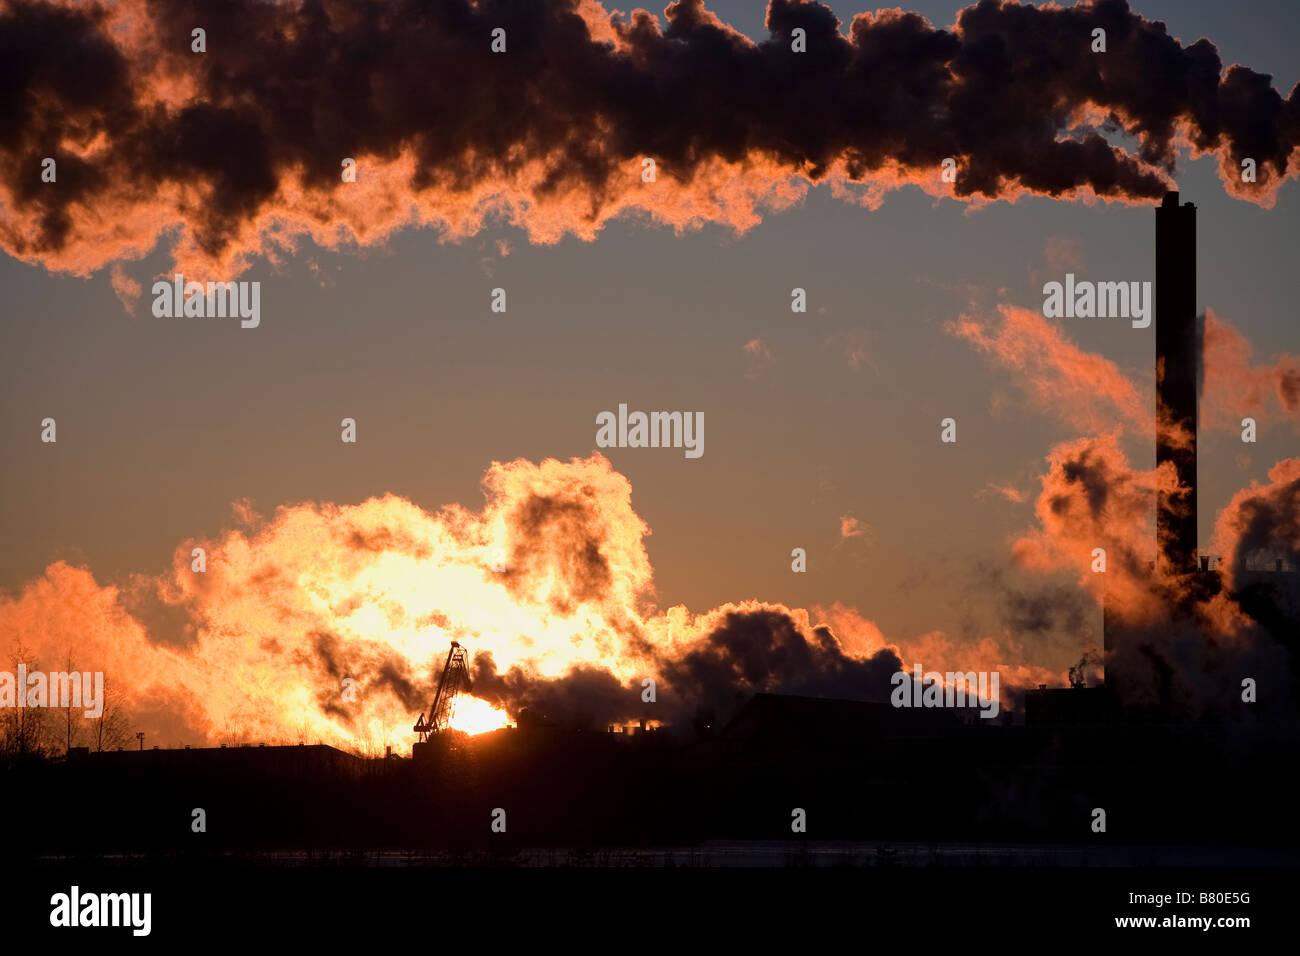 Stora-Enso paper mill at Nuottasaari Oulu Finland smoking at dawn - Stock Image